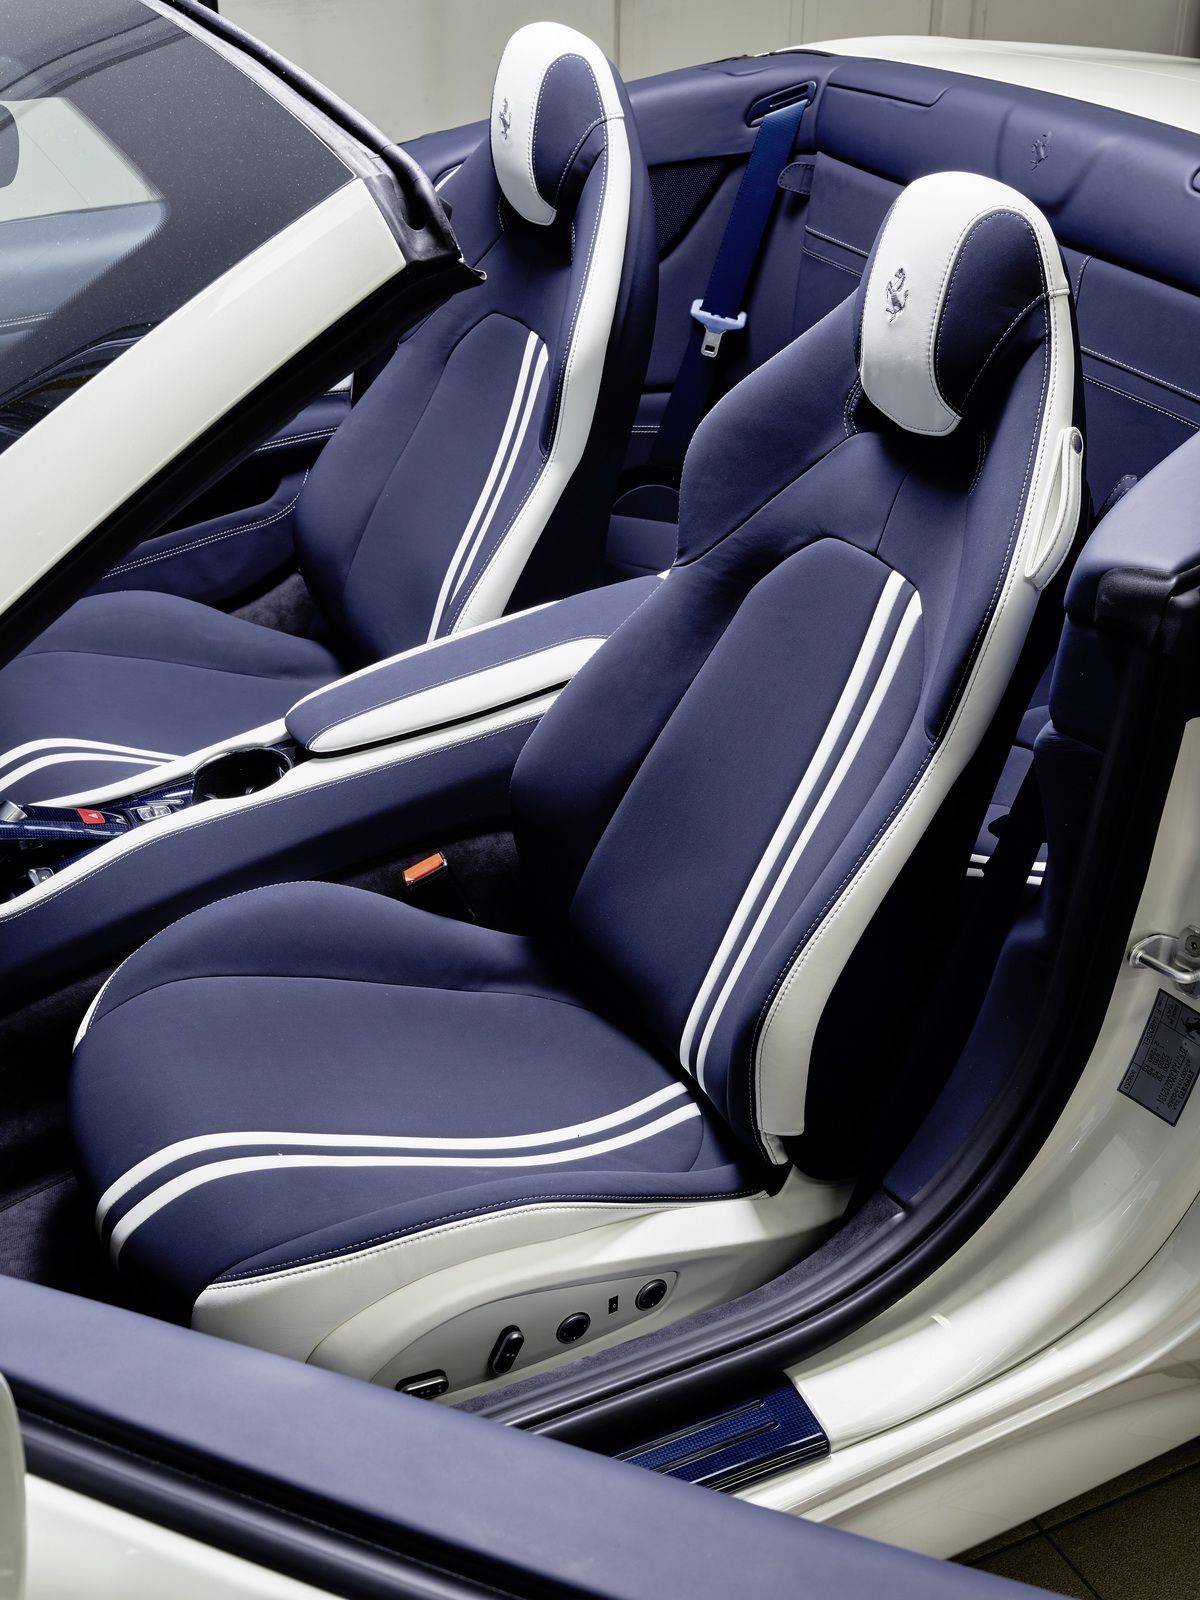 california show t kent cover furlonger in at simon for sale ferrari cars ashford used car